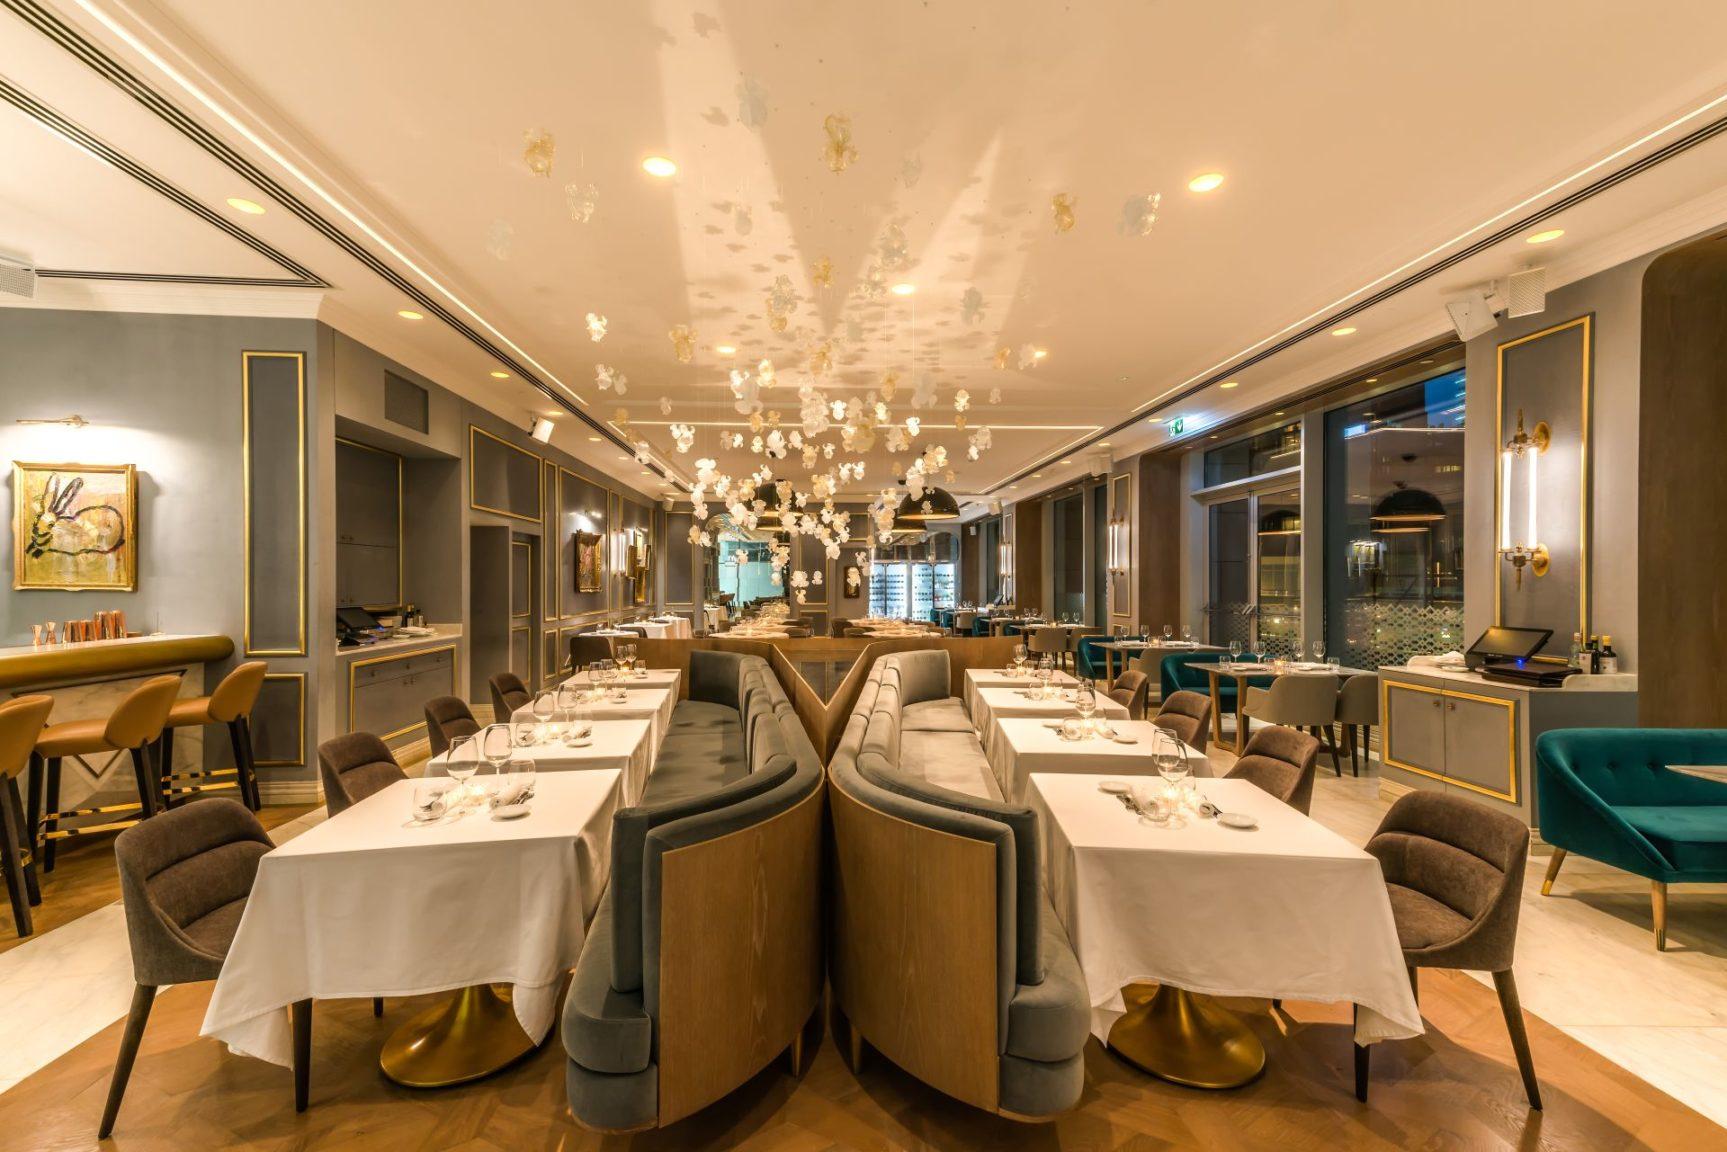 Restaurant Designs The Artisan Difc Dubai Love That Design